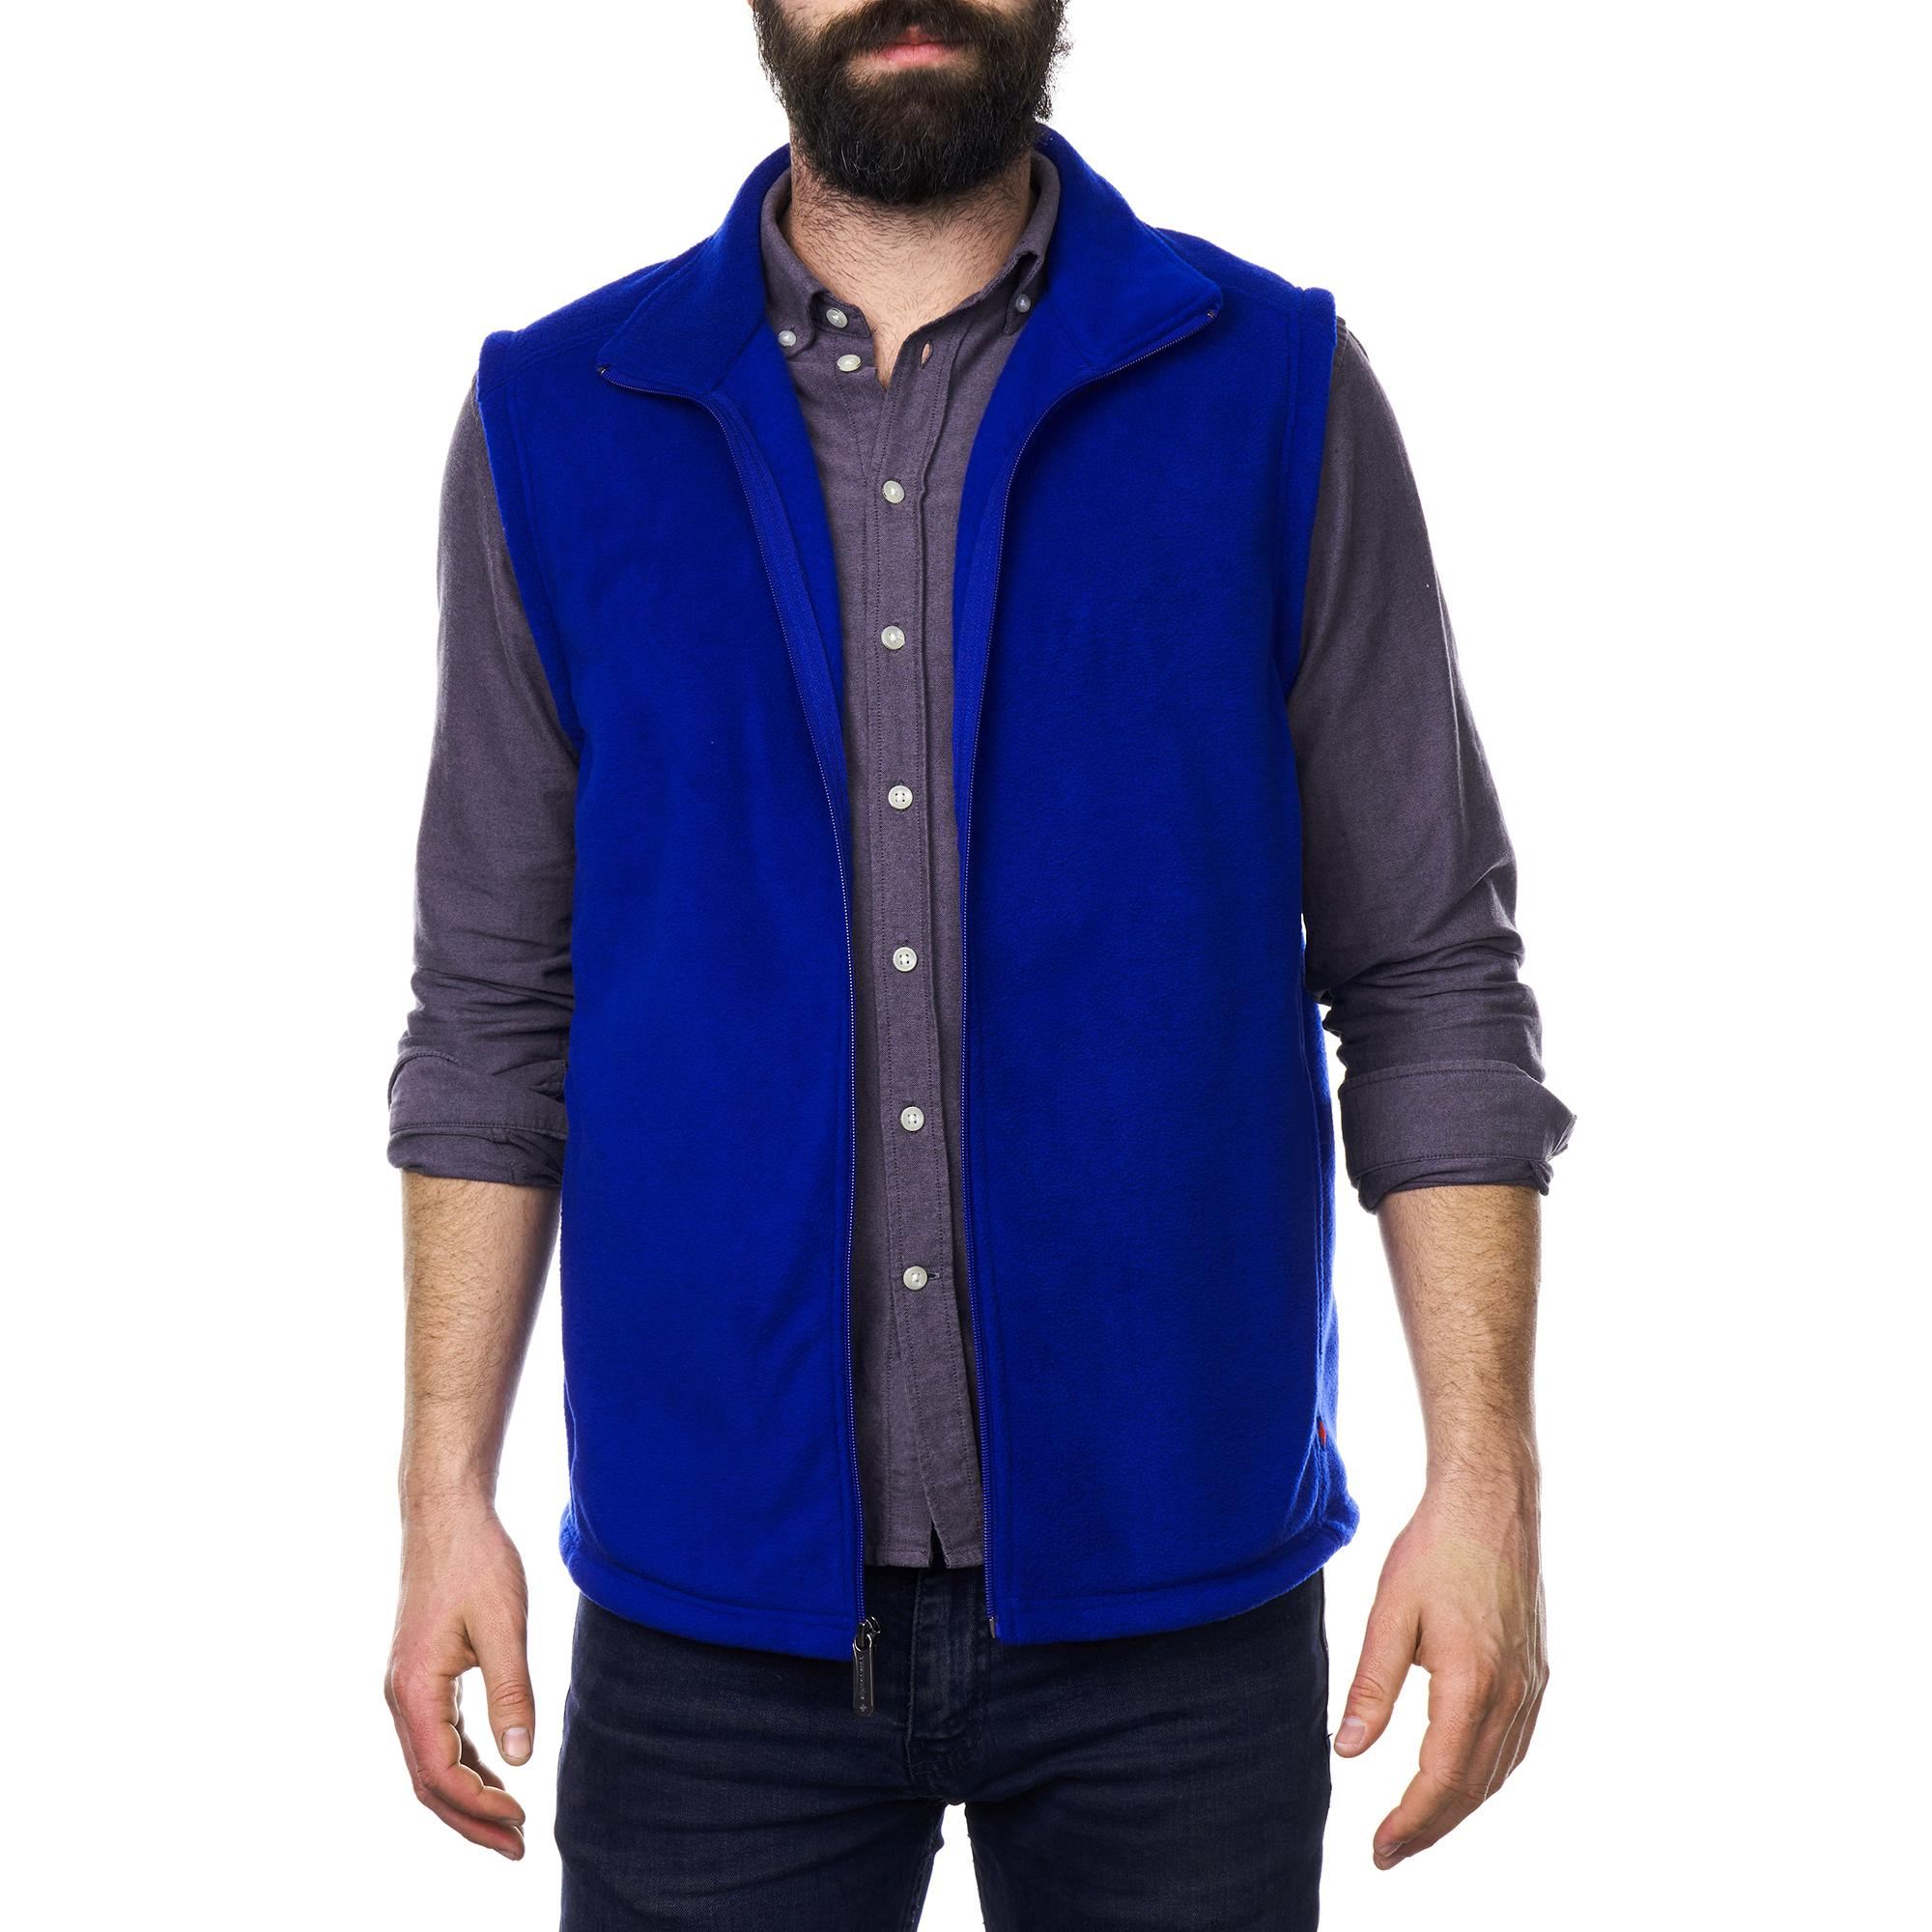 Alpine-Swiss-Mens-Full-Zip-Up-Fleece-Vest-Lightweight-Warm-Sleeveless-Jacket thumbnail 22